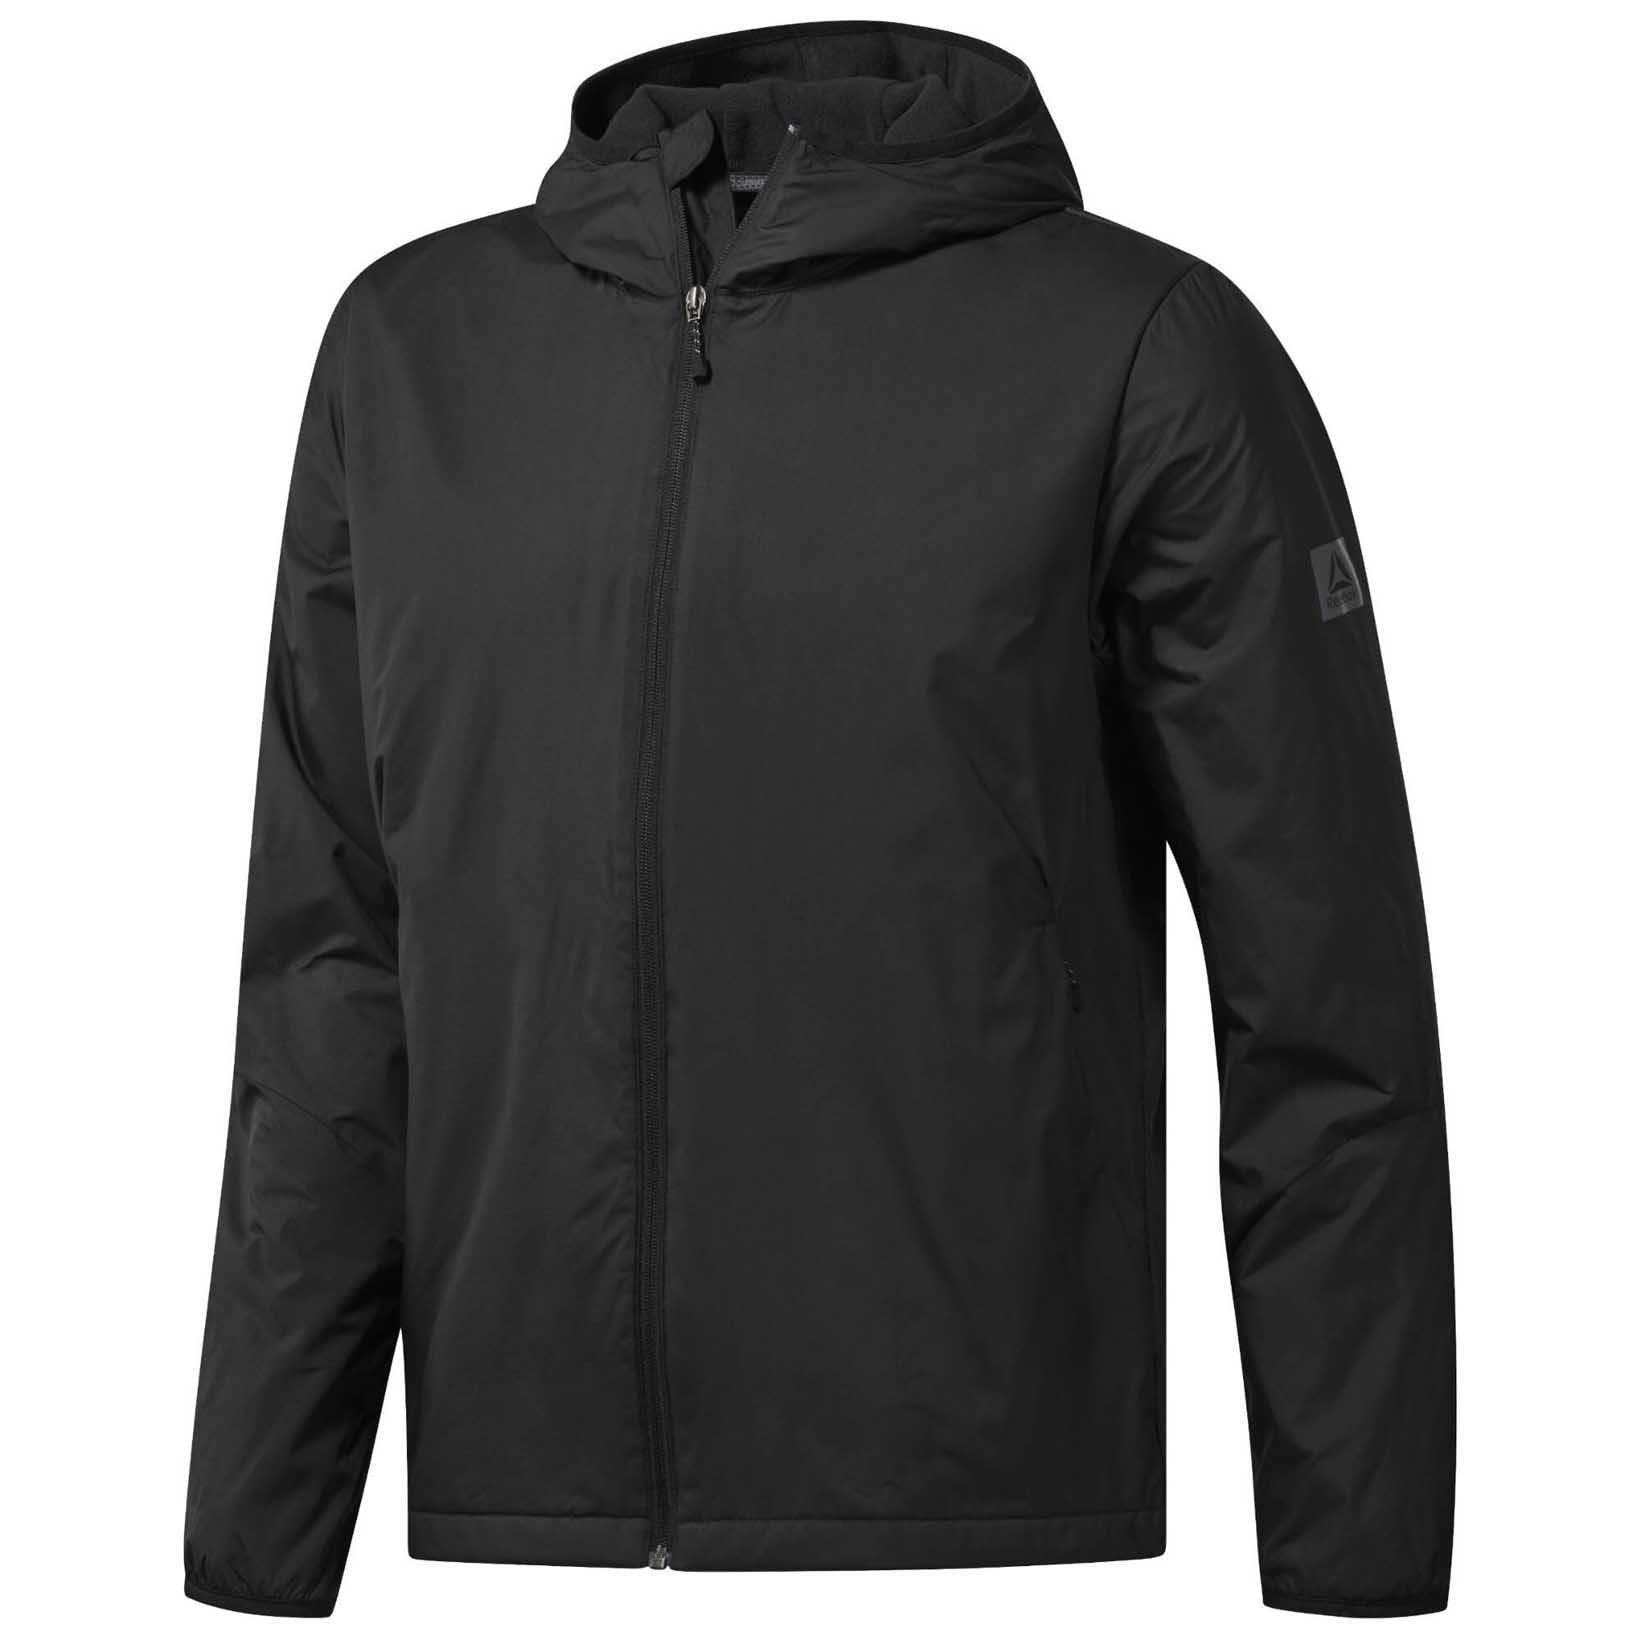 Мужская куртка Reebok Outdoor Fleece Lined CY4603 44-46 RU